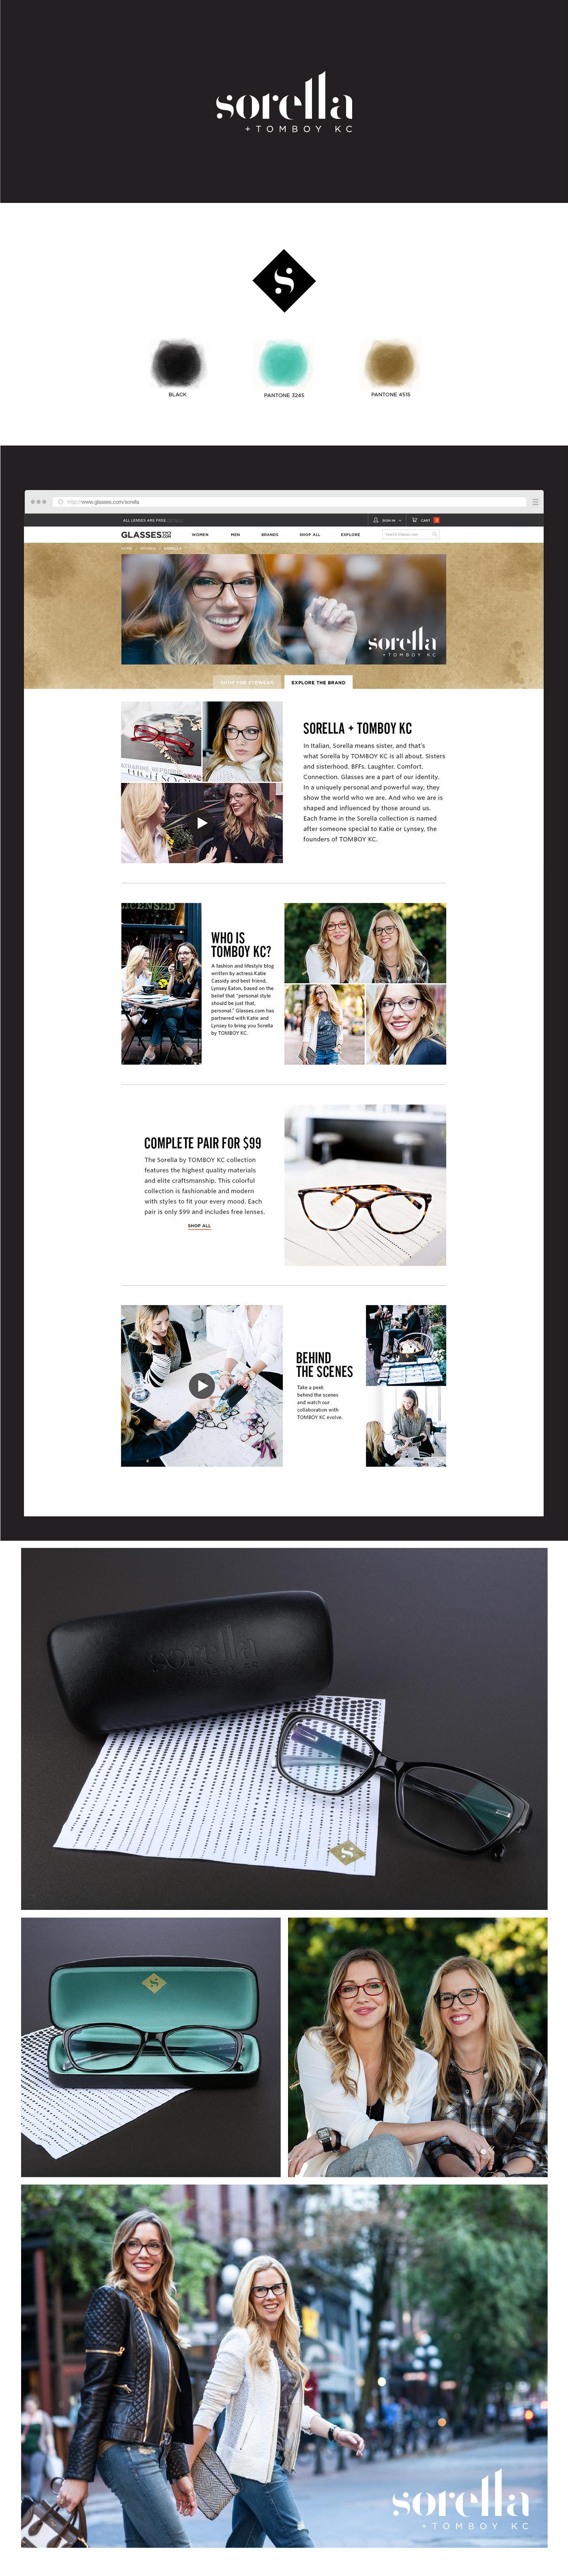 Web design Sorella tomboy kc glasses